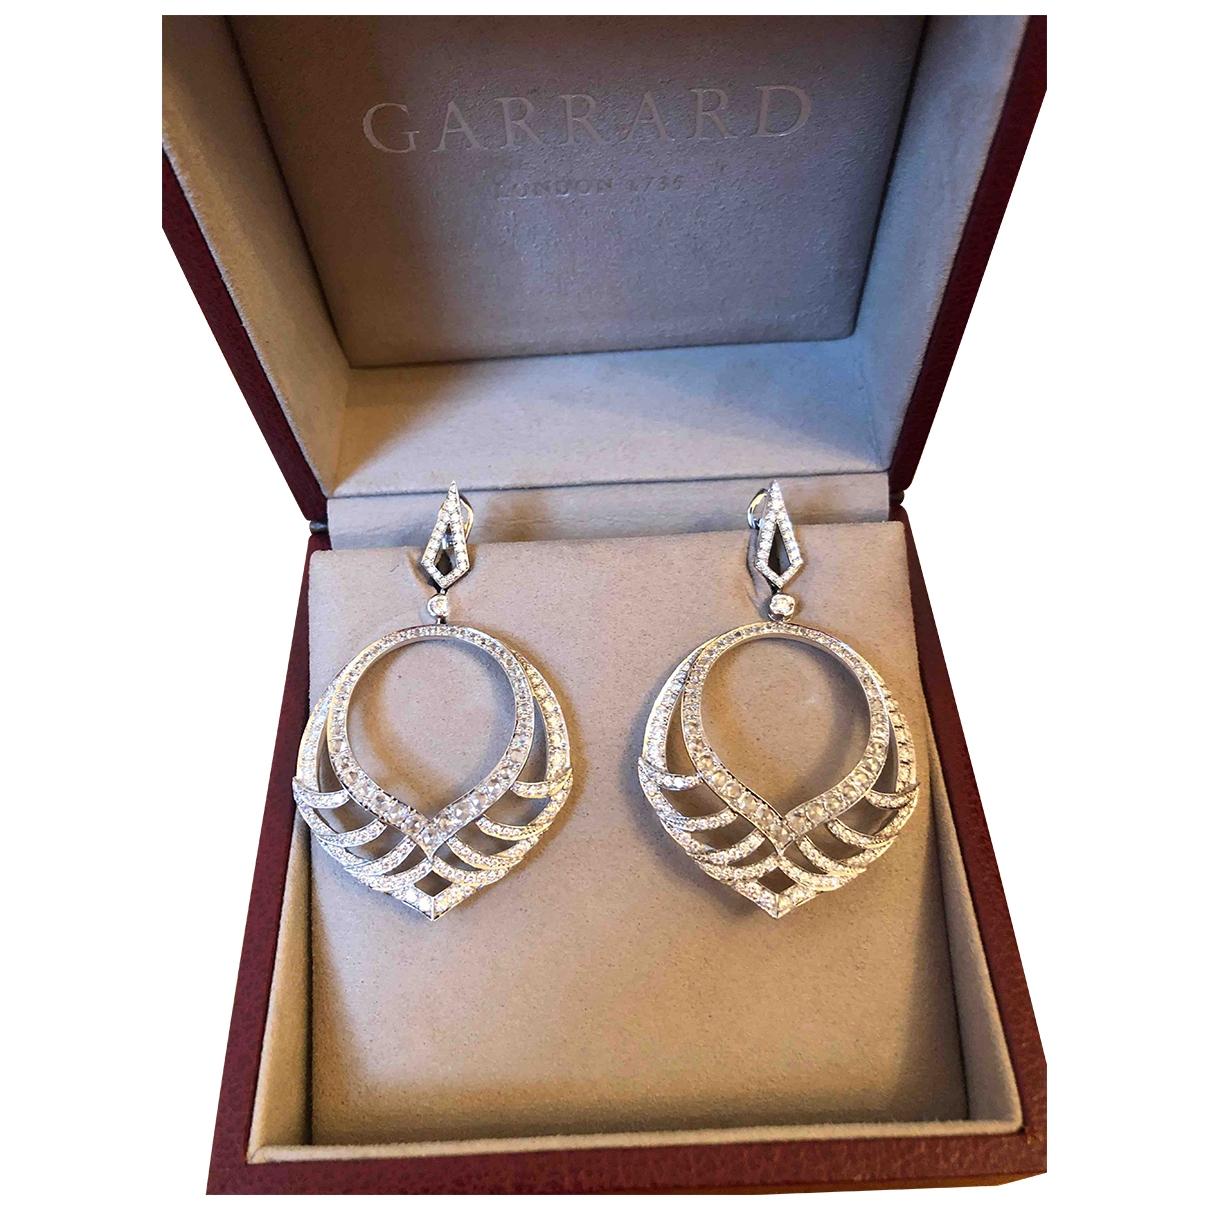 Garrard \N Silver White gold Earrings for Women \N